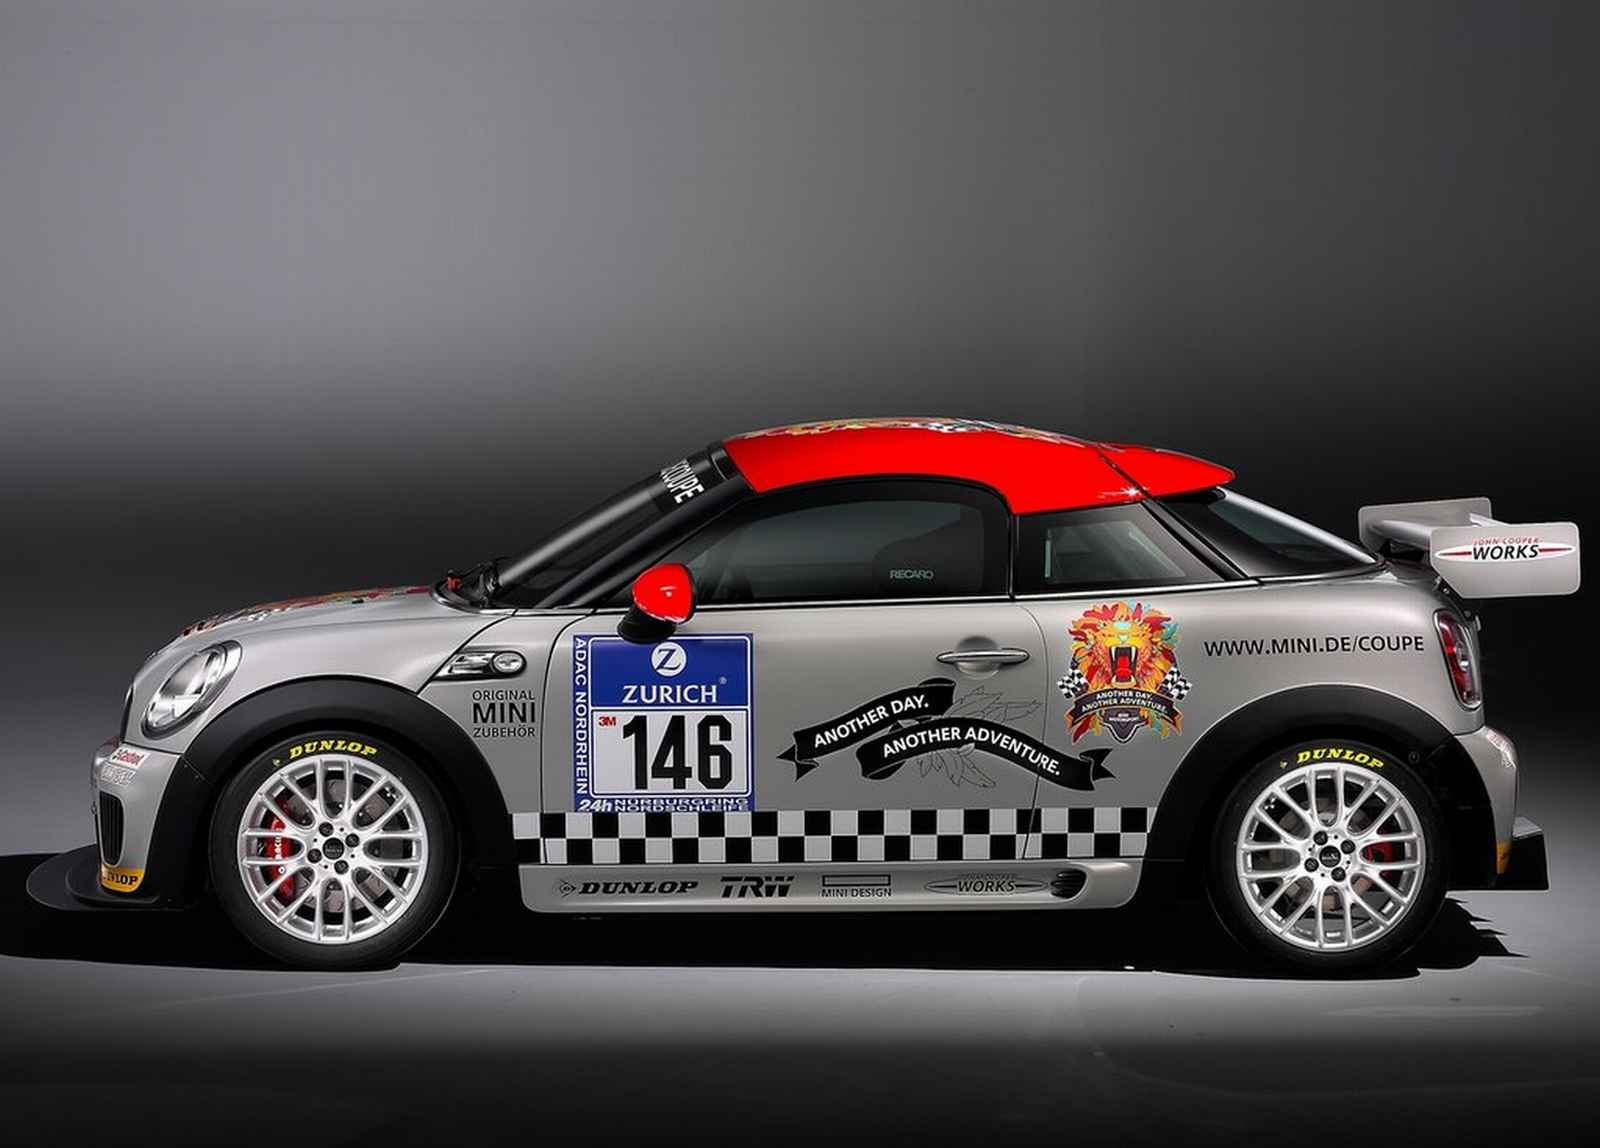 2011 Mini John Cooper Works Coupe Endurance Tattoo Art Design